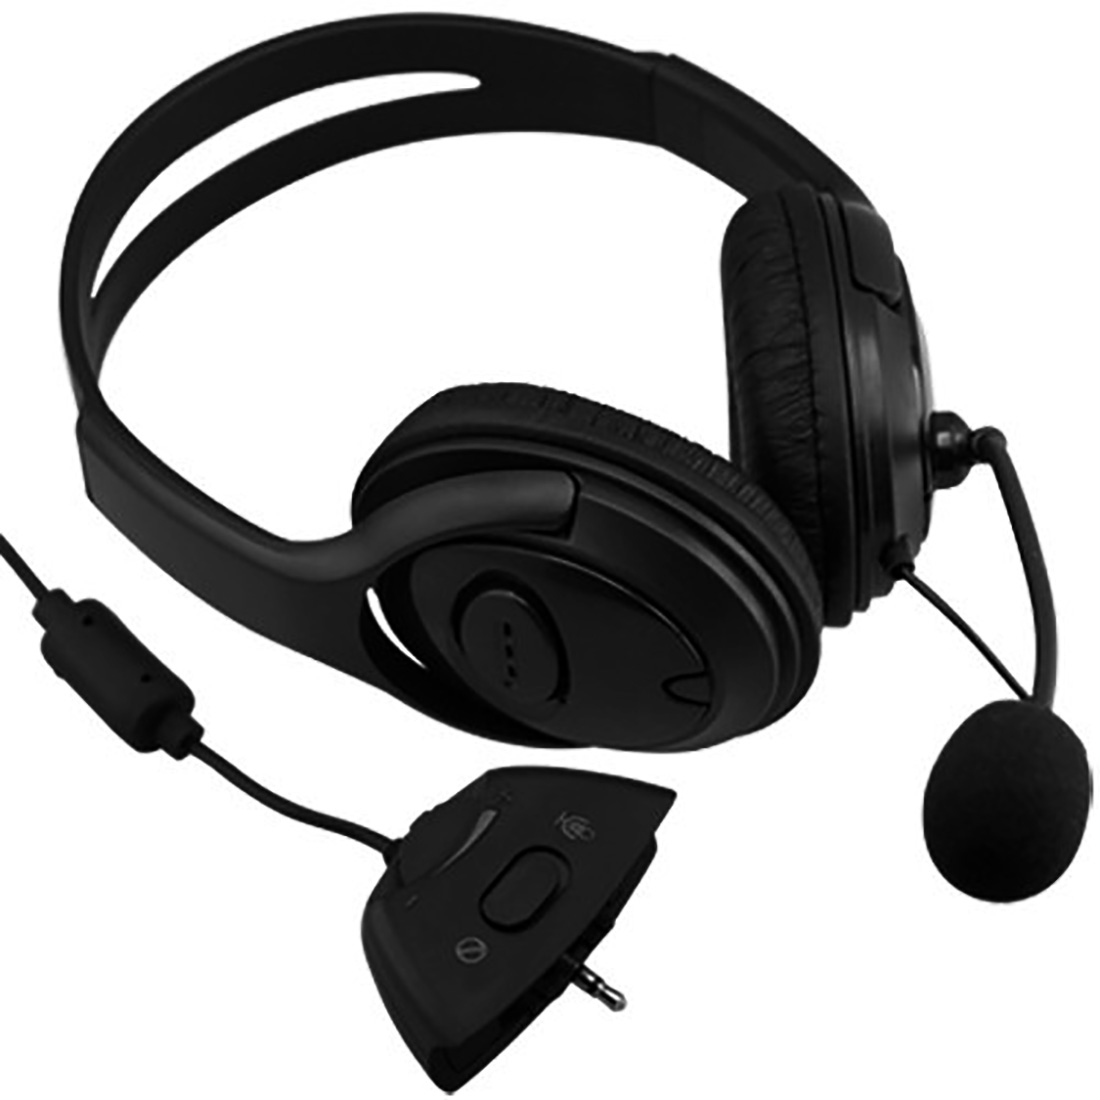 все цены на Marsnaska New Hot Sale protable Wired Gaming Chat dual Headset Headphone Microphone for xbox 360 computer Black онлайн